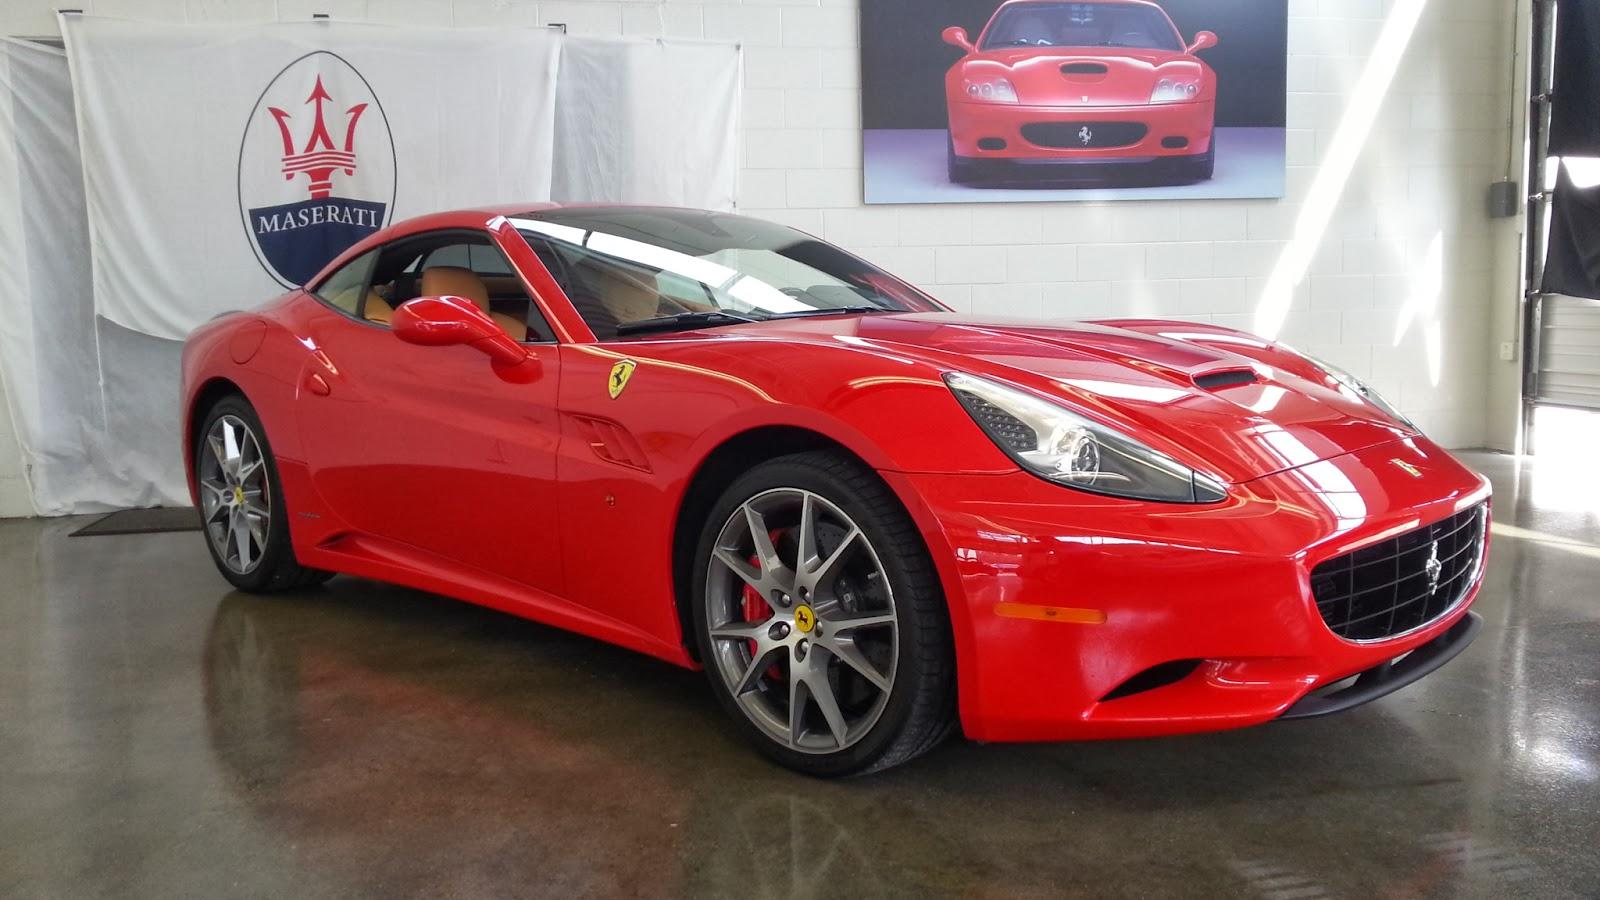 Used Cars Charlotte Nc >> Ferrari's Sporty, Elegant and Versatile. The Prancing ...